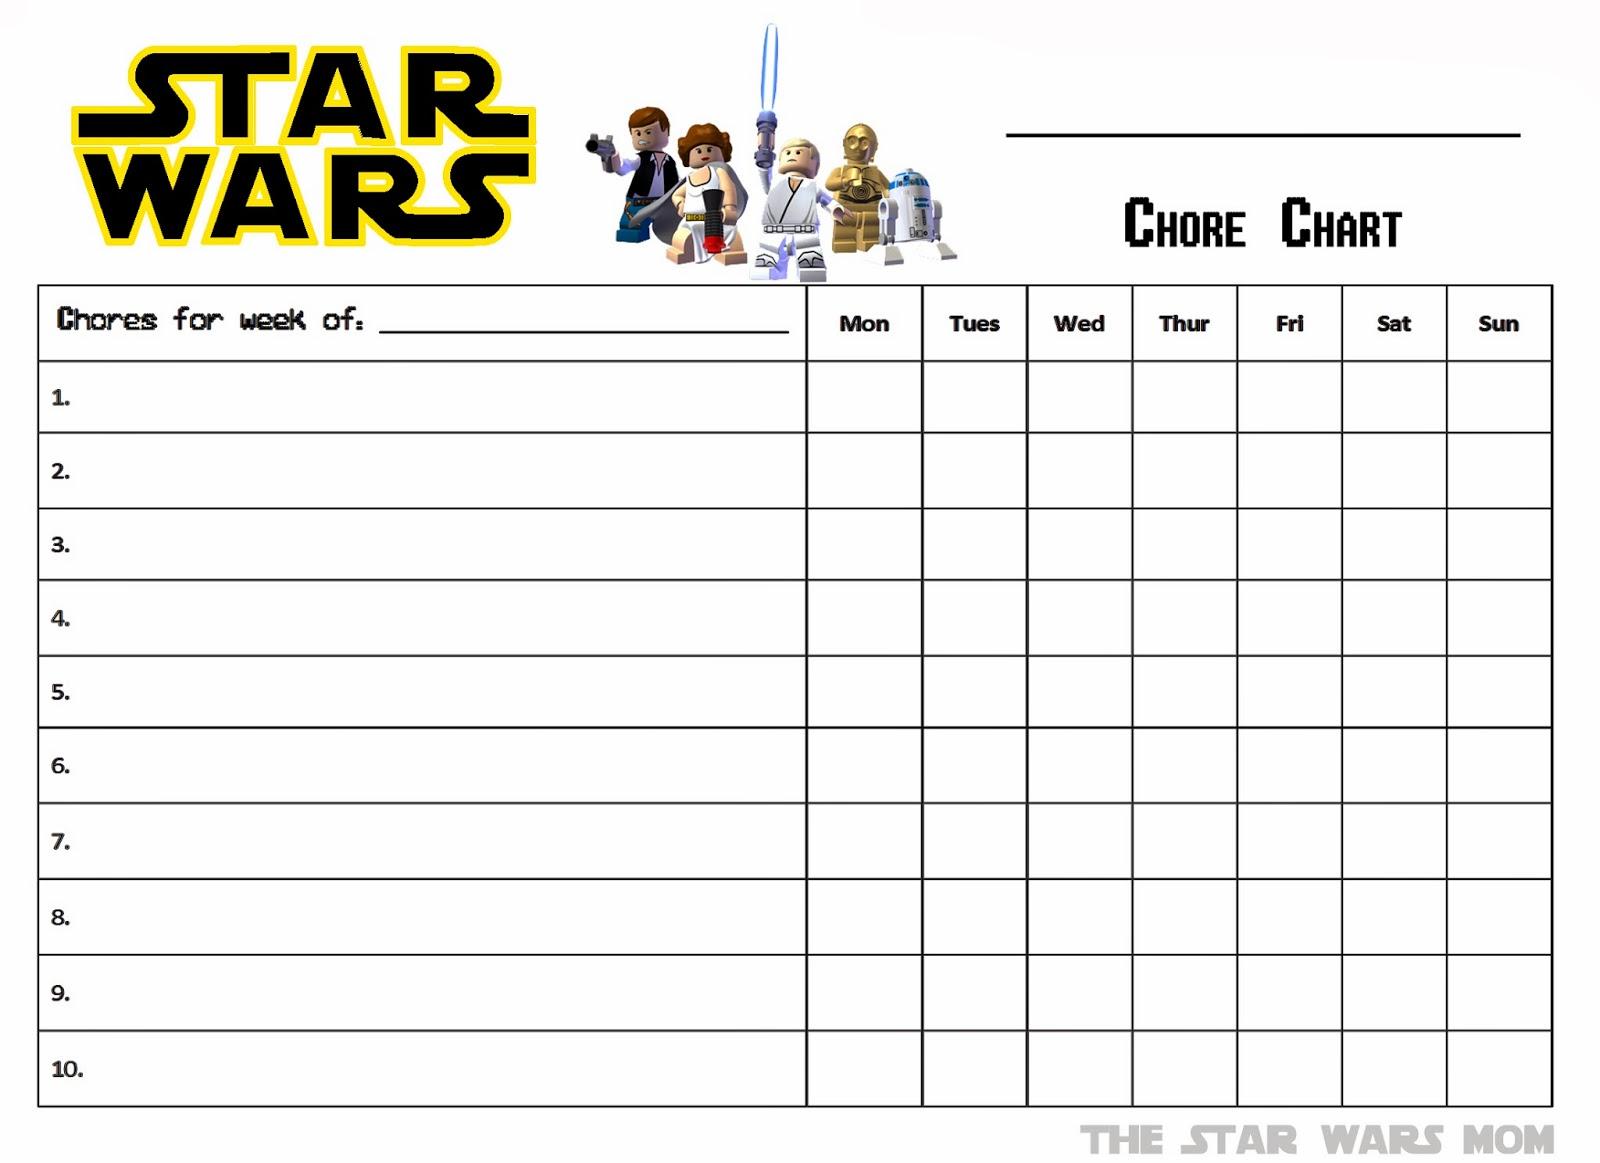 Star Wars Printable Calendars 2016 | Calendar Template 2019 regarding Star Wars Templates Printables Calendar